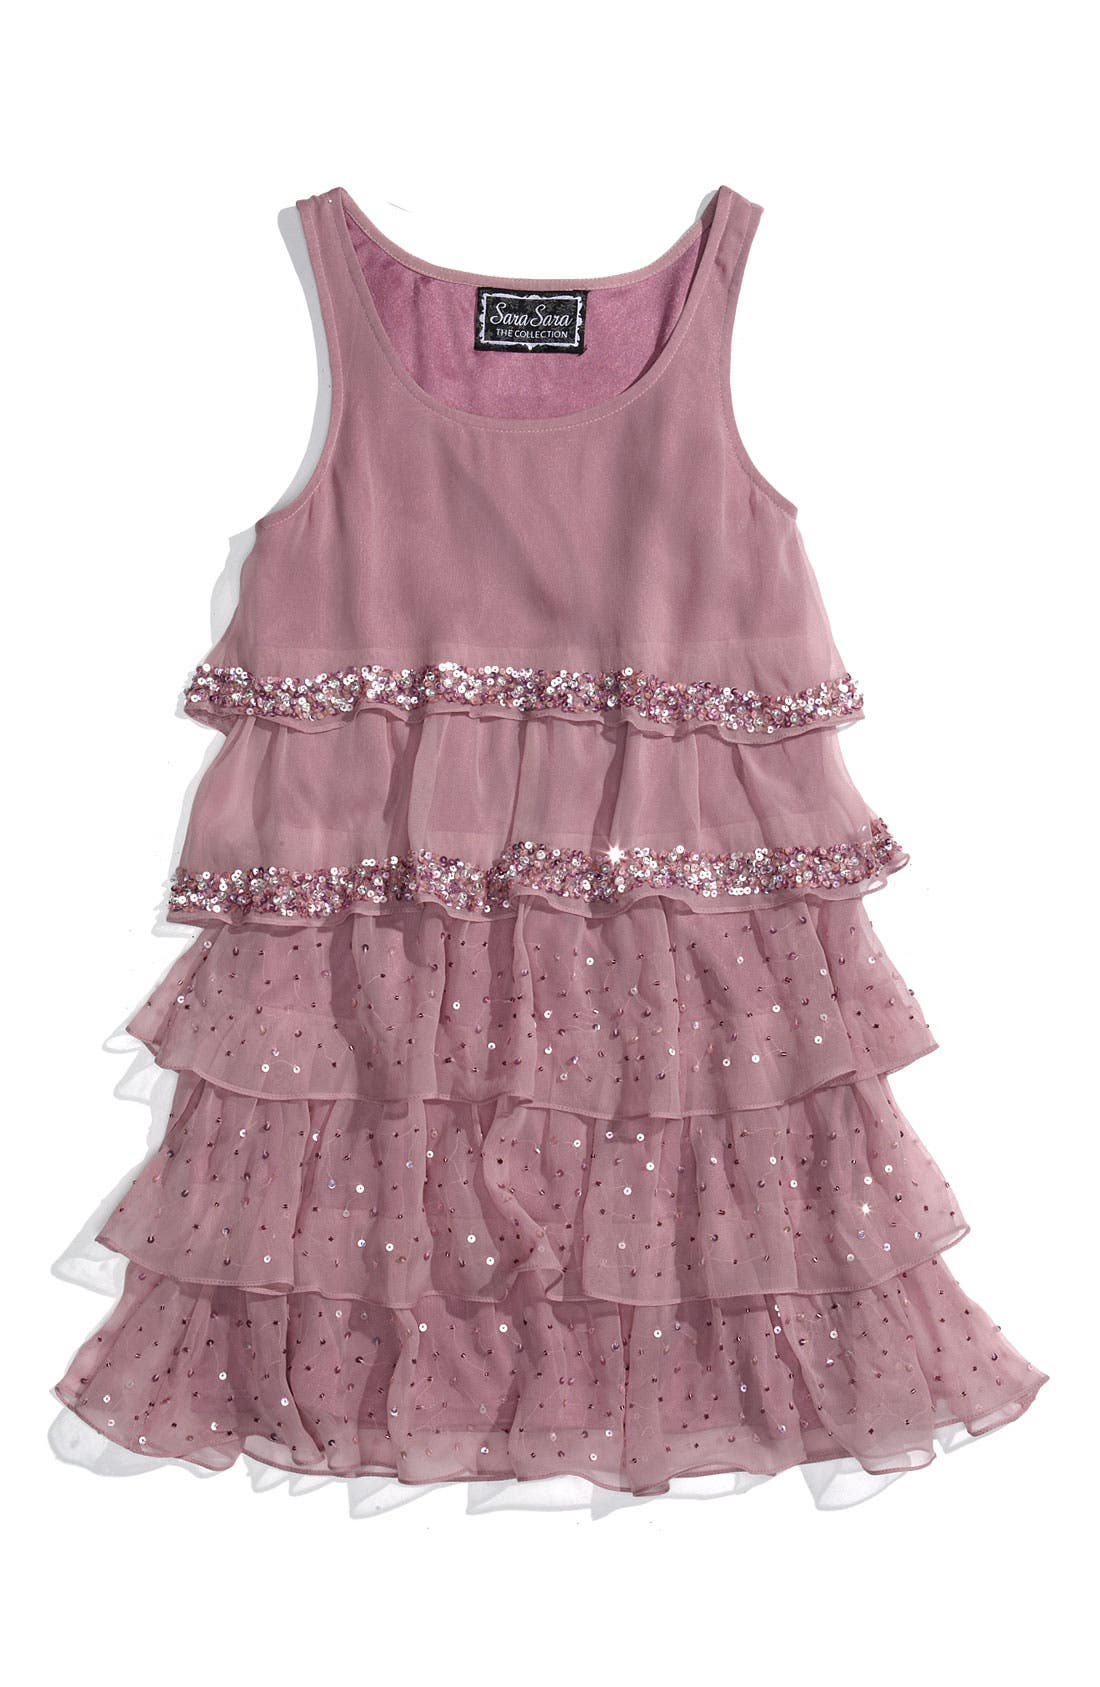 Alternate Image 1 Selected - Sara Sara Tiered Dress (Big Girls)